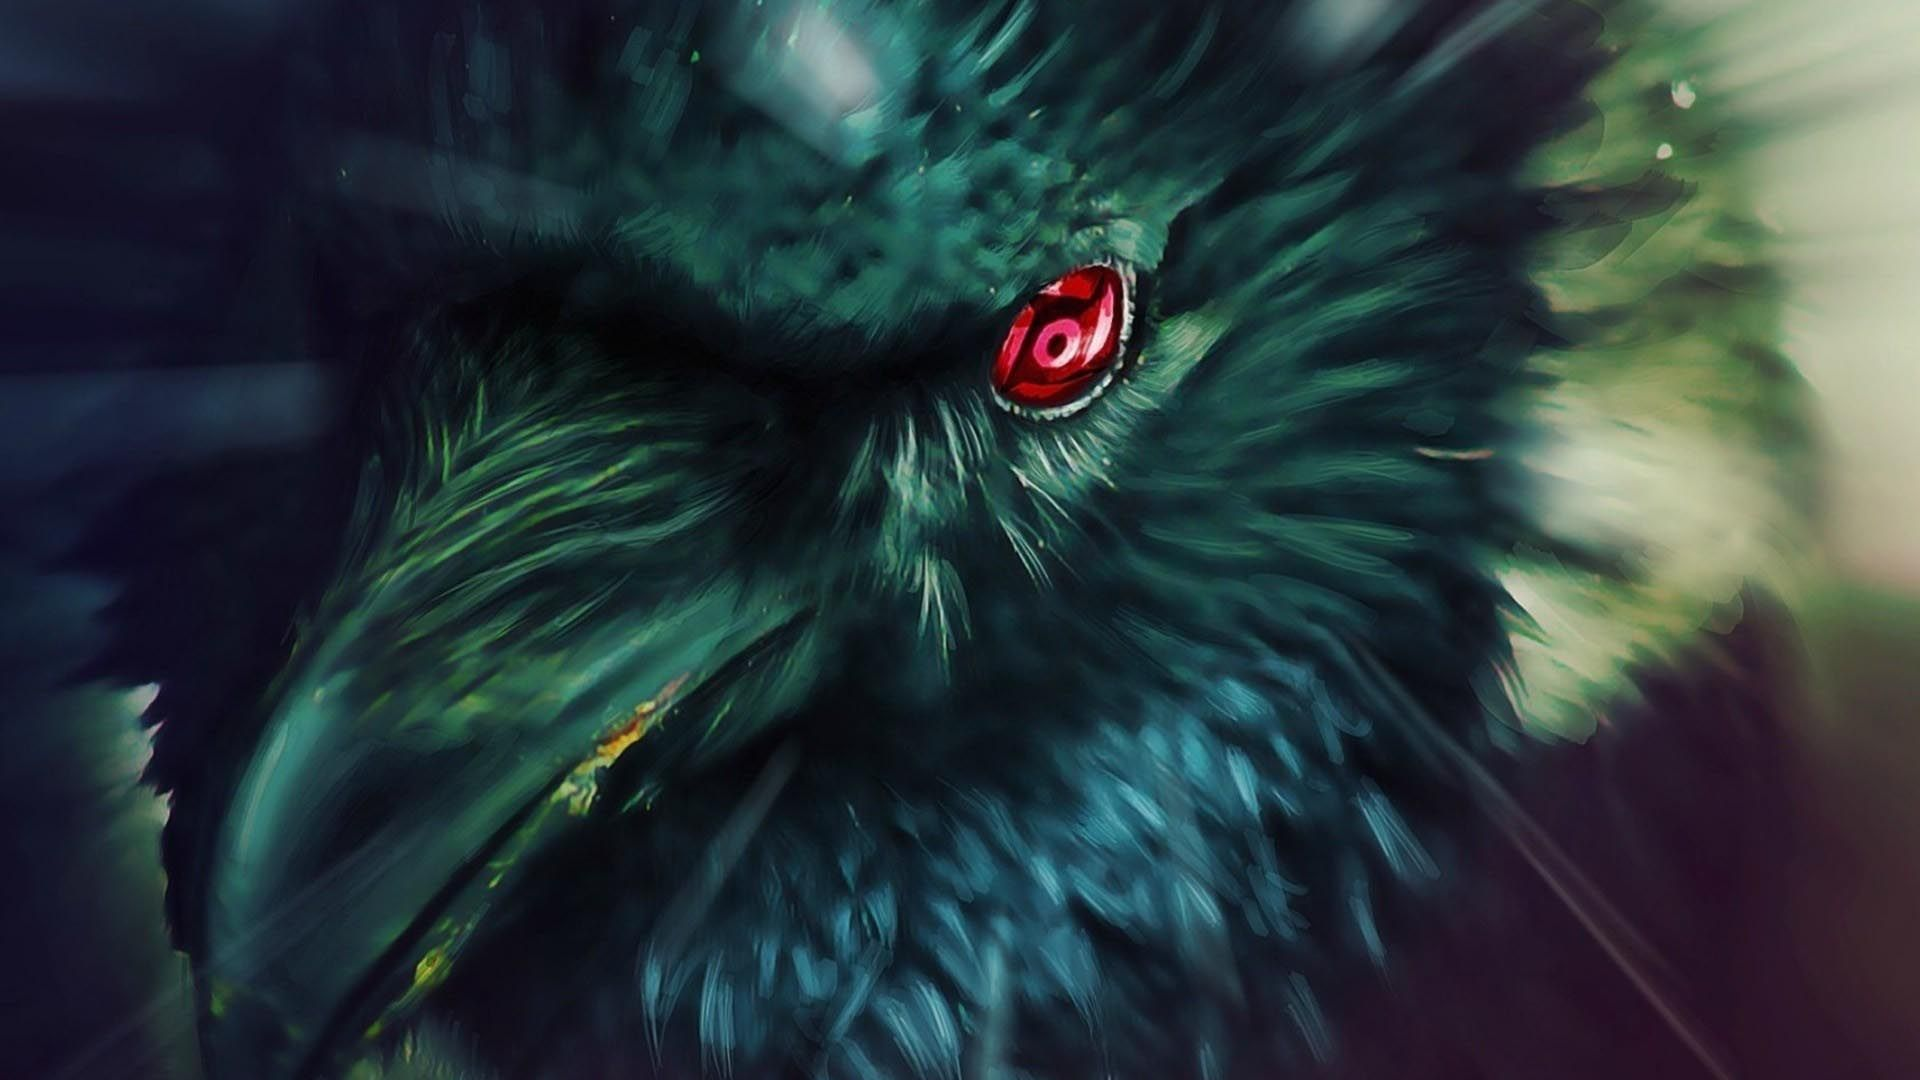 Naruto Shippuden Crow Raven Bird Wallpaper anime/manga